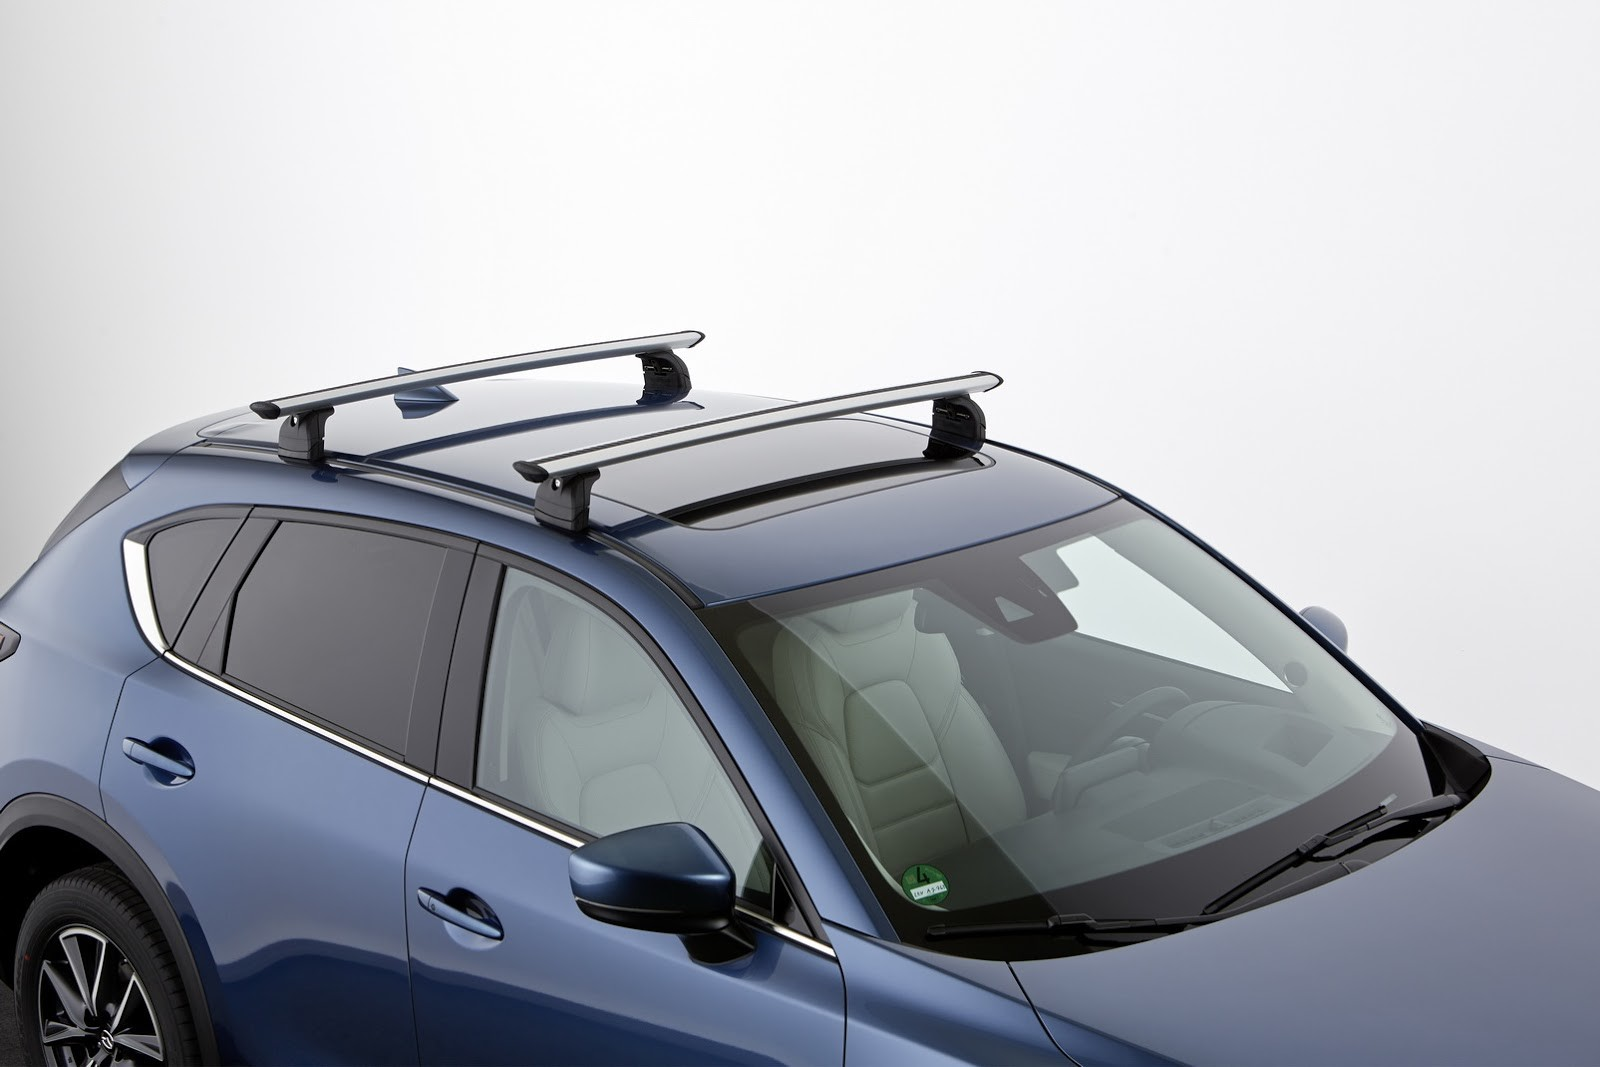 Foto de Accesorios para Mazda CX-3 - CX-5 (5/12)